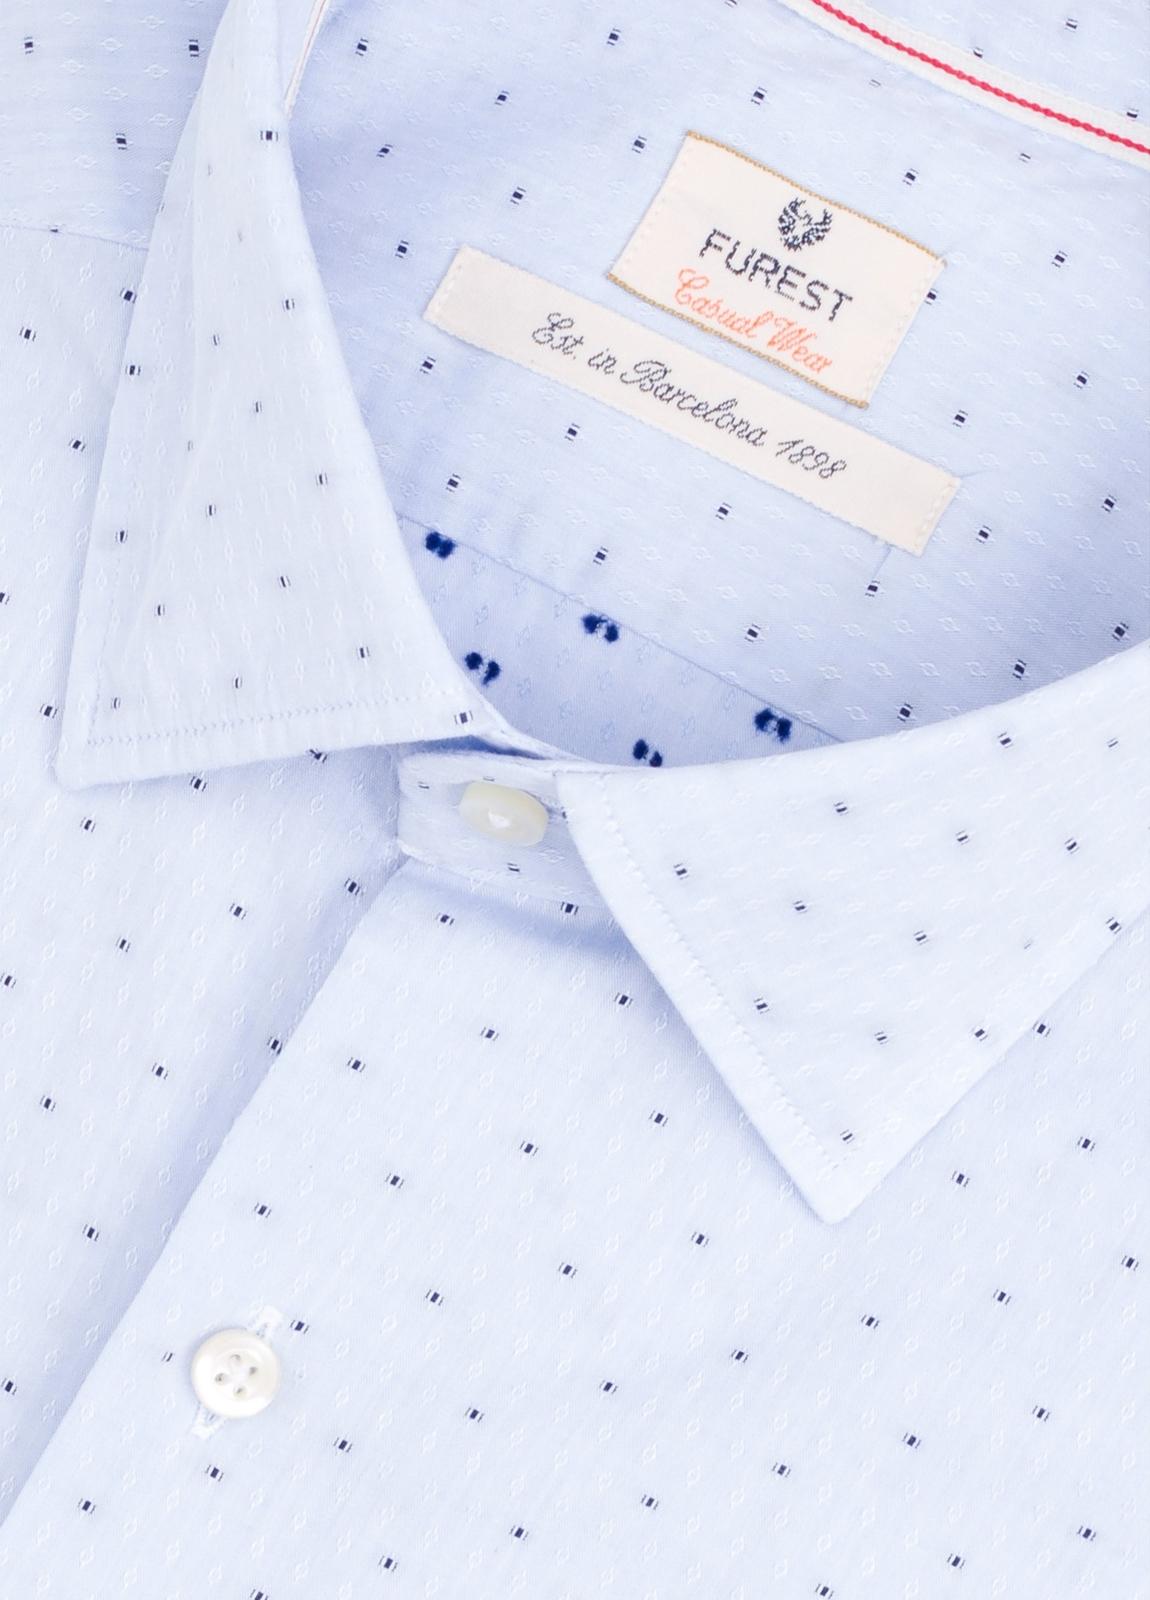 Camisa Casual Wear SLIM FIT Modelo PORTO microdibujo color celeste.100% Algodón. - Ítem1